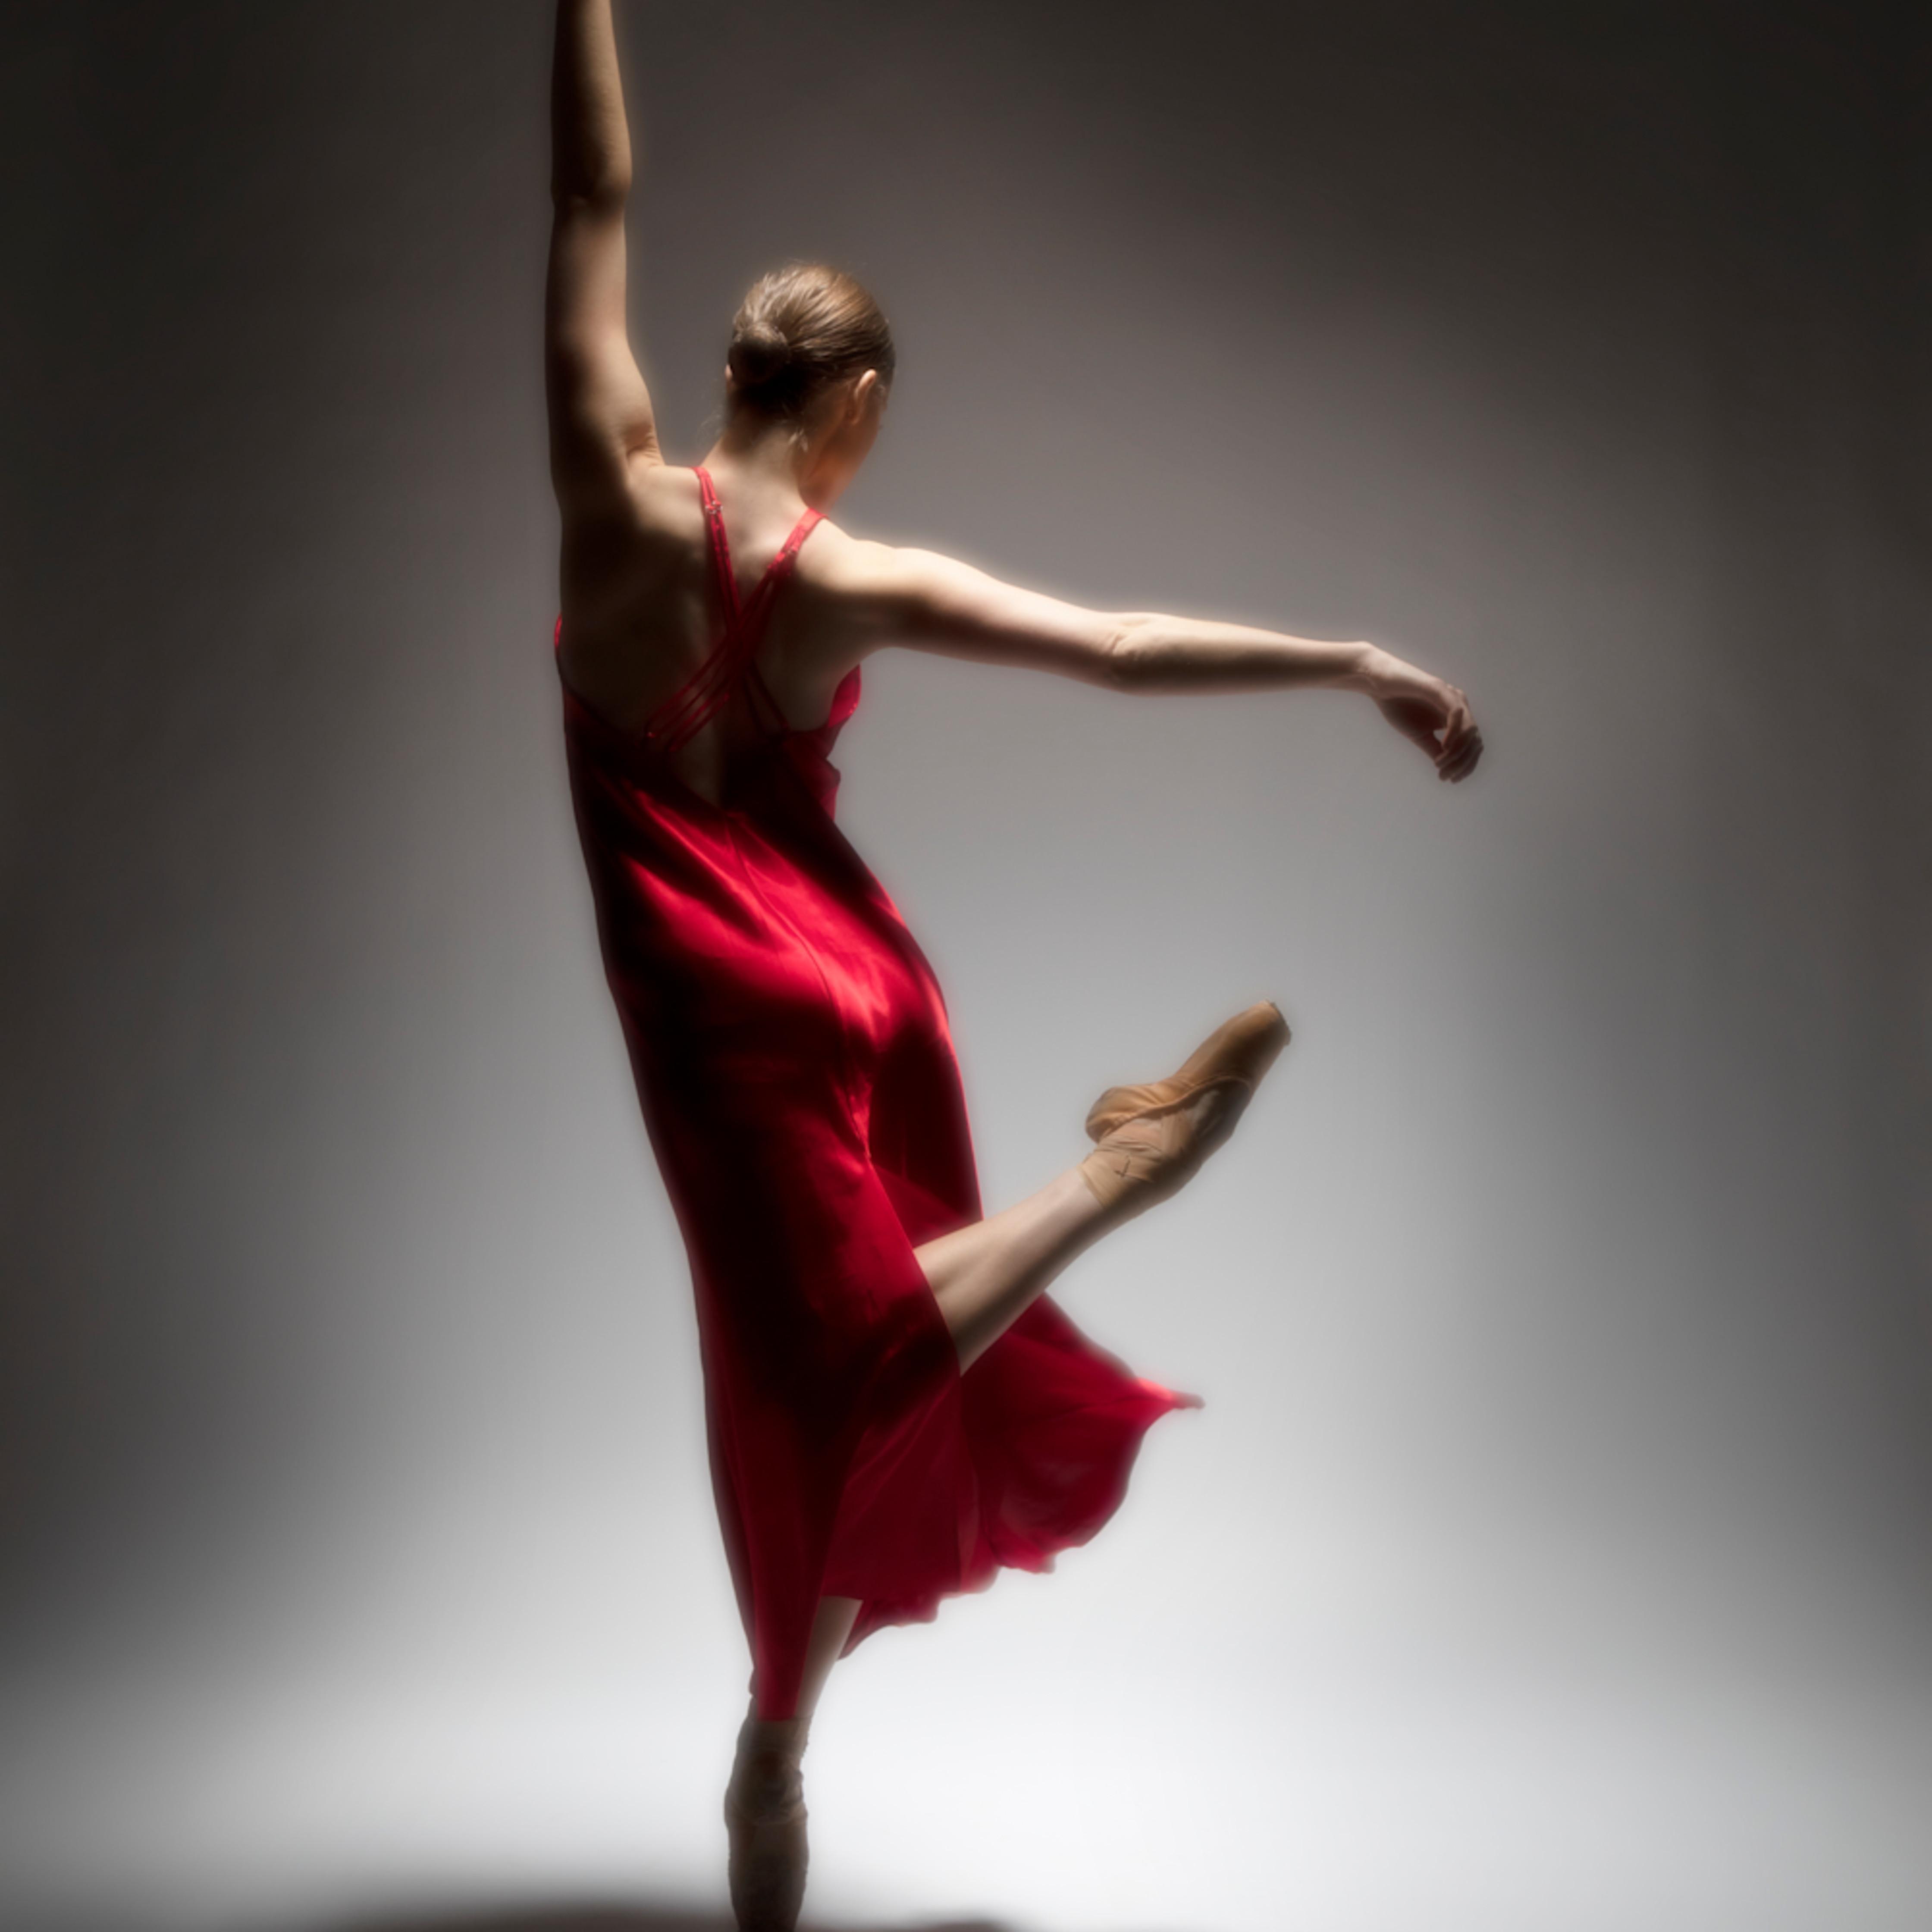 Ballet in a red dress acp52k